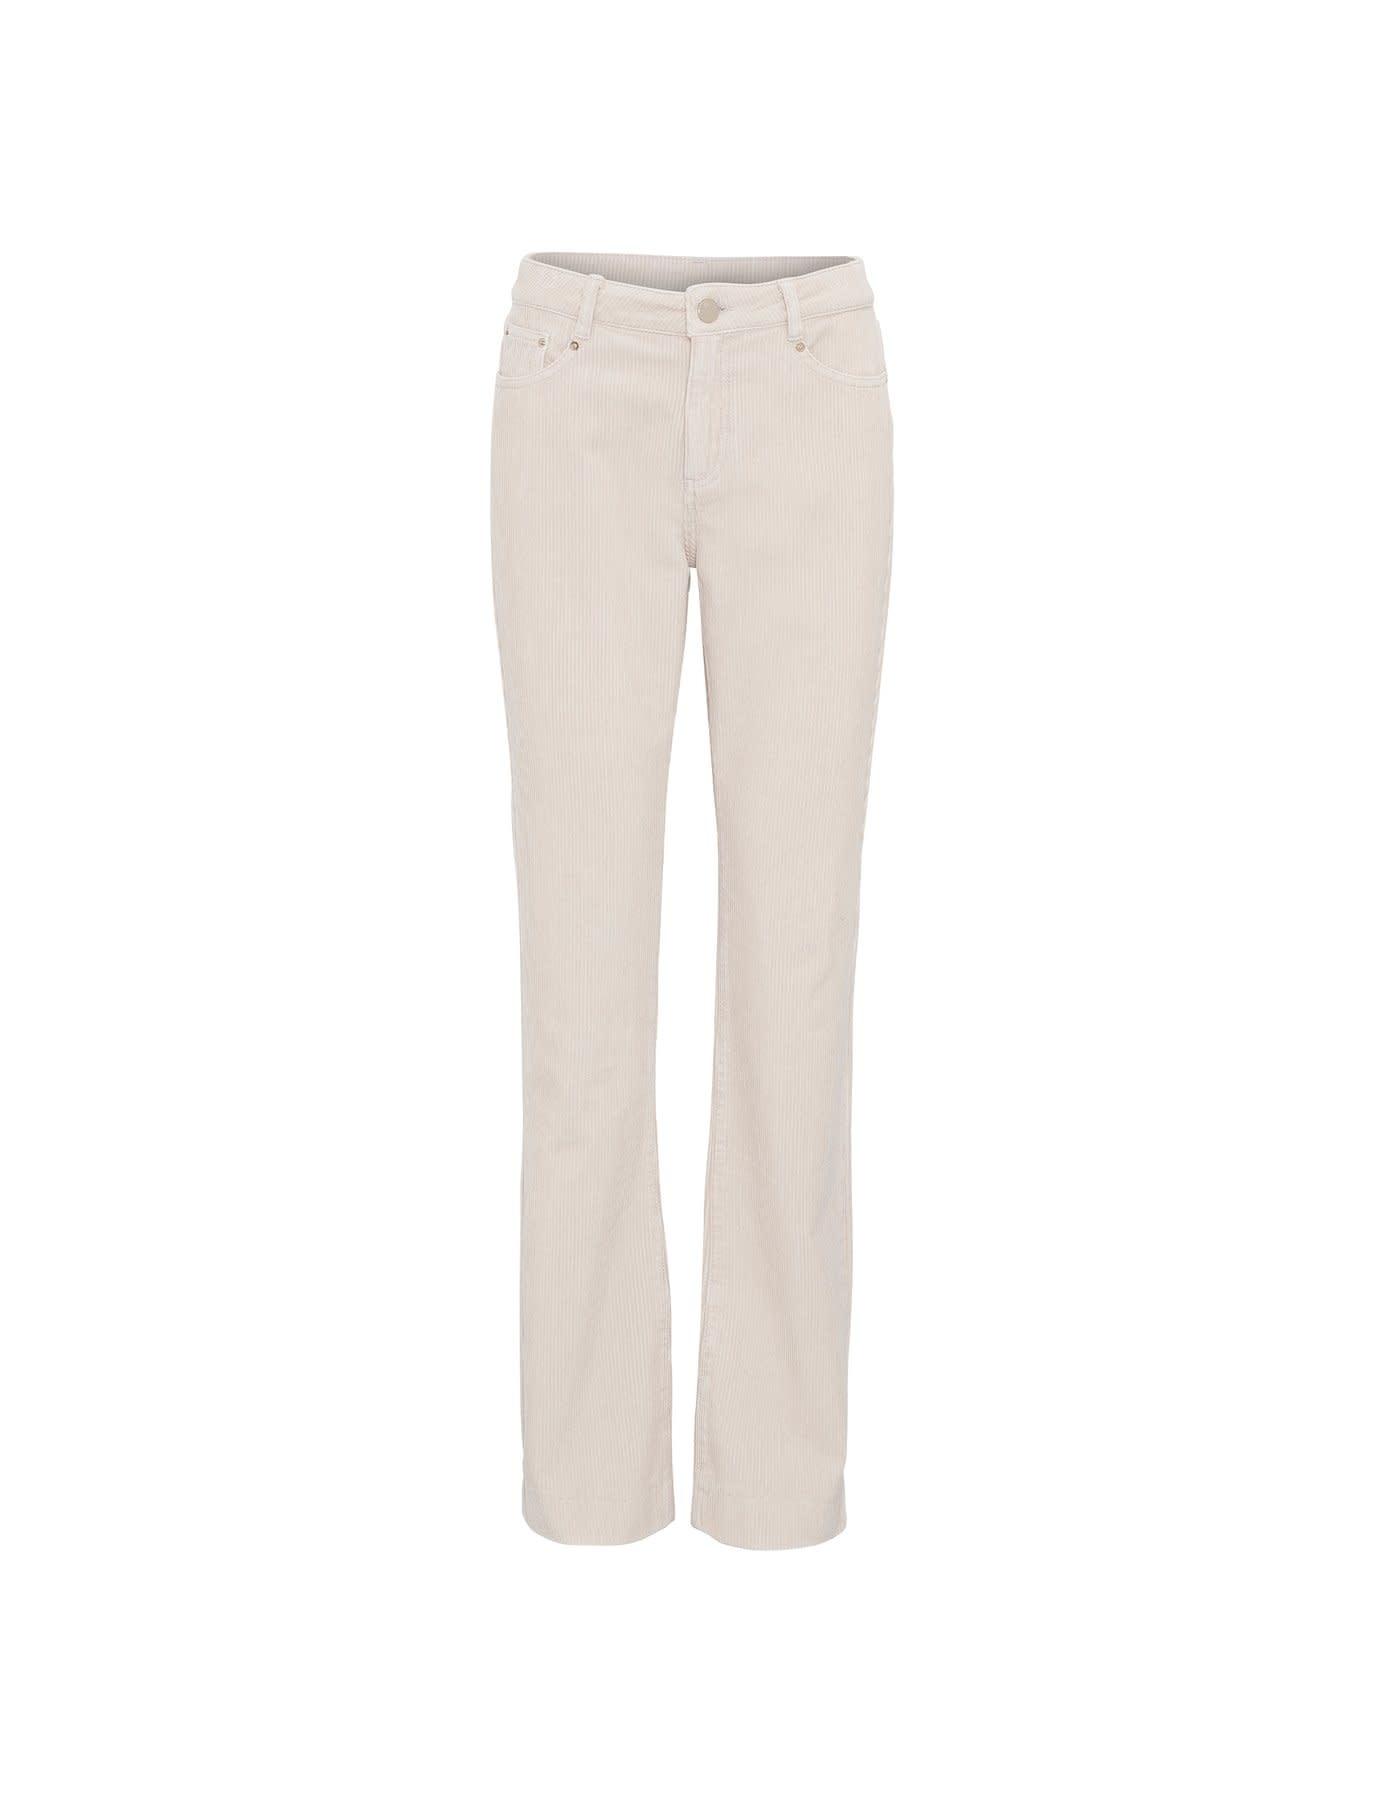 Cadife pants Day-1